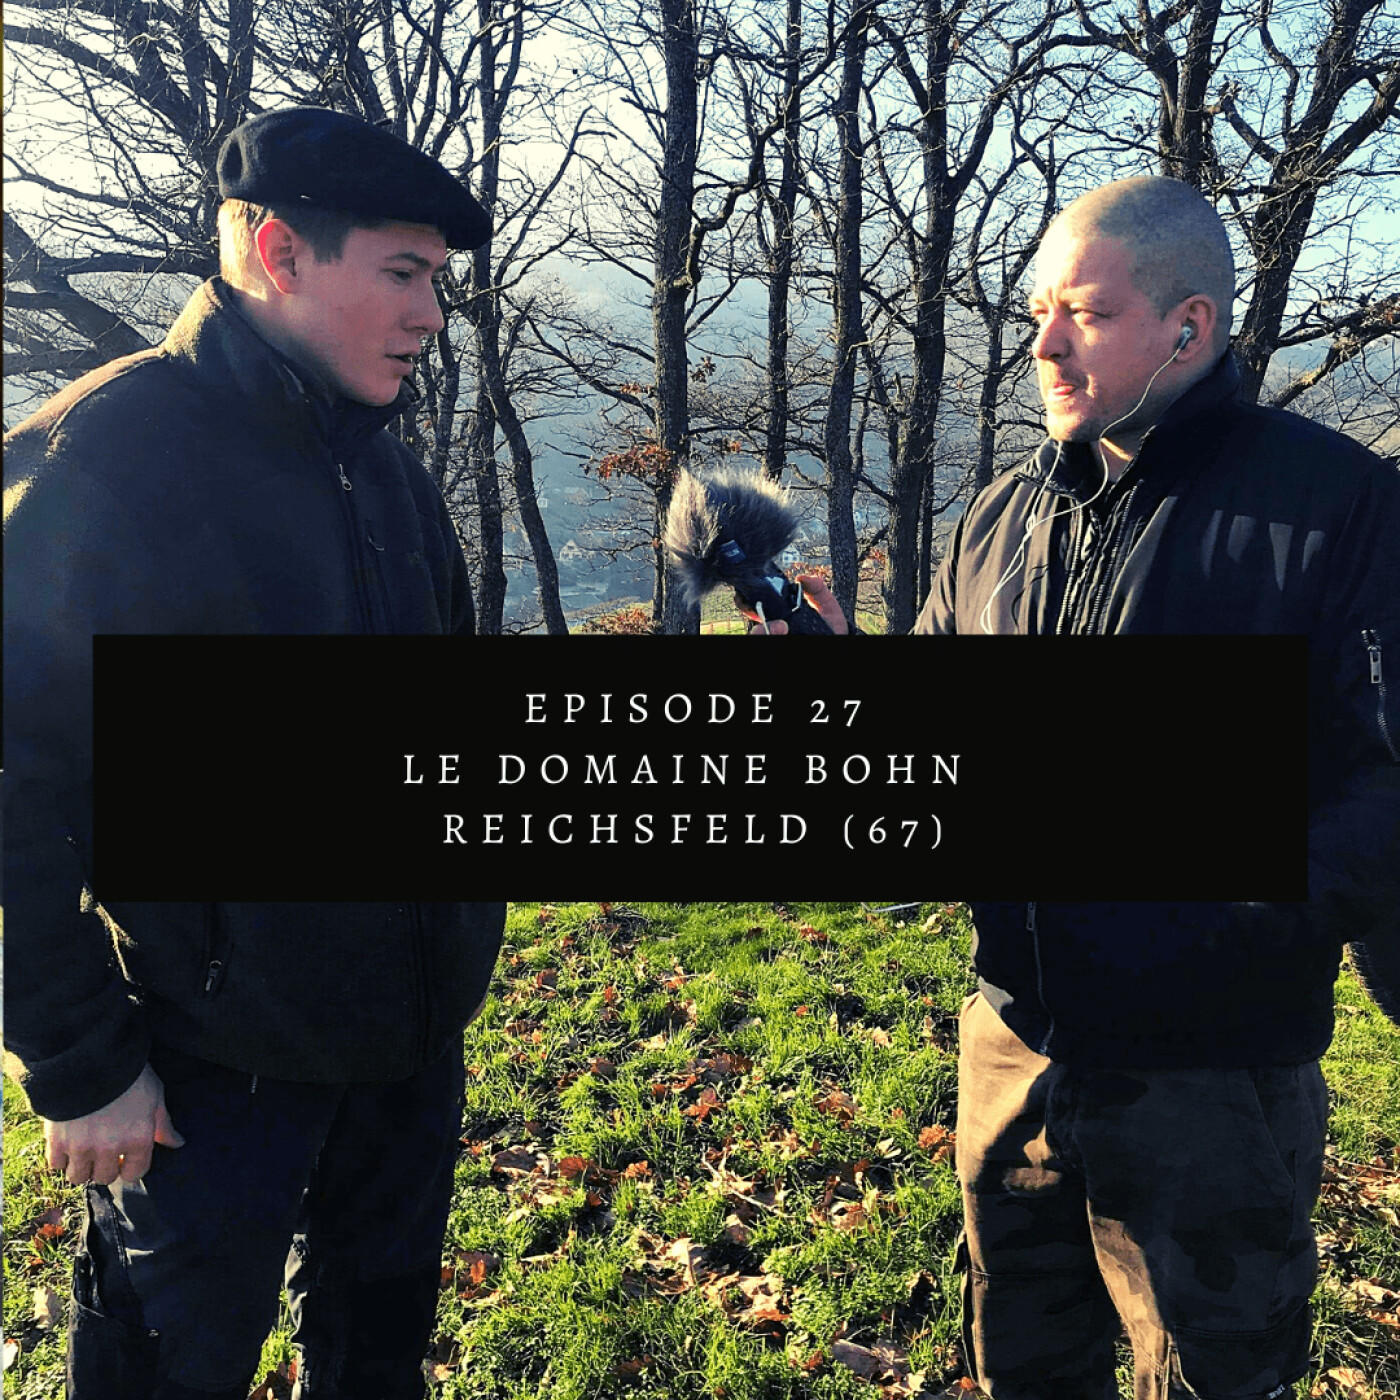 #27: Le Domaine Bohn à Reichsfeld (67)